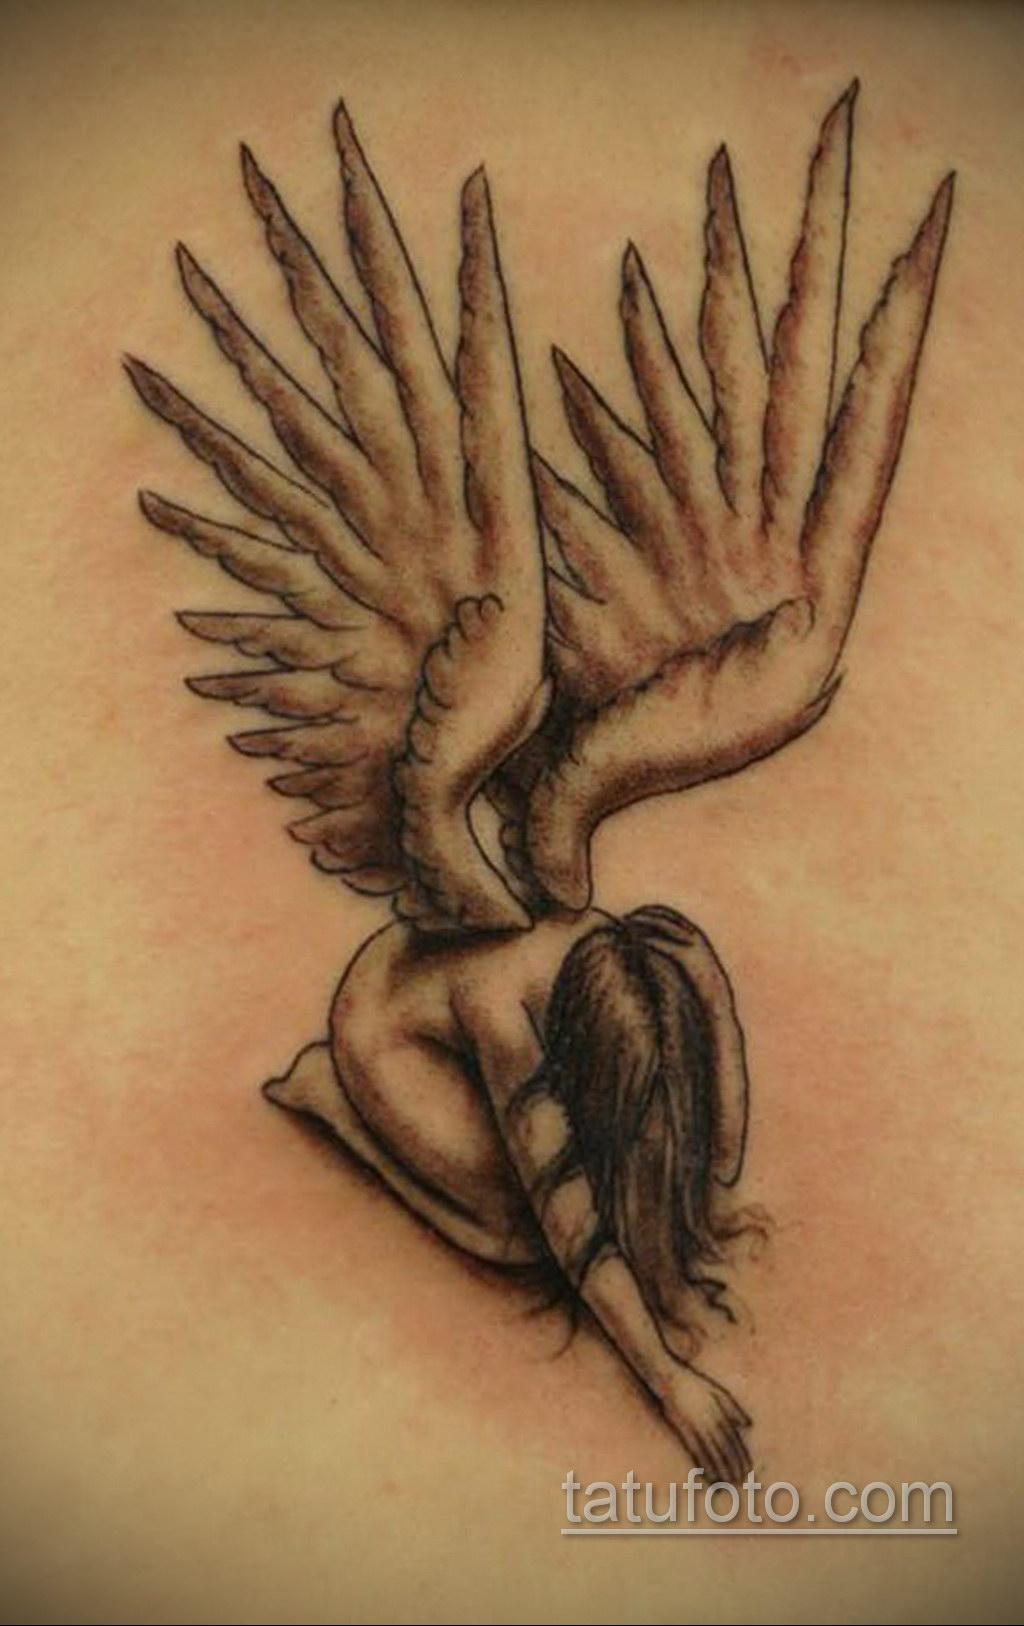 Фото ангельского рисунка тату 22.11.2020 №074 -Angelic tattoo- tatufoto.com